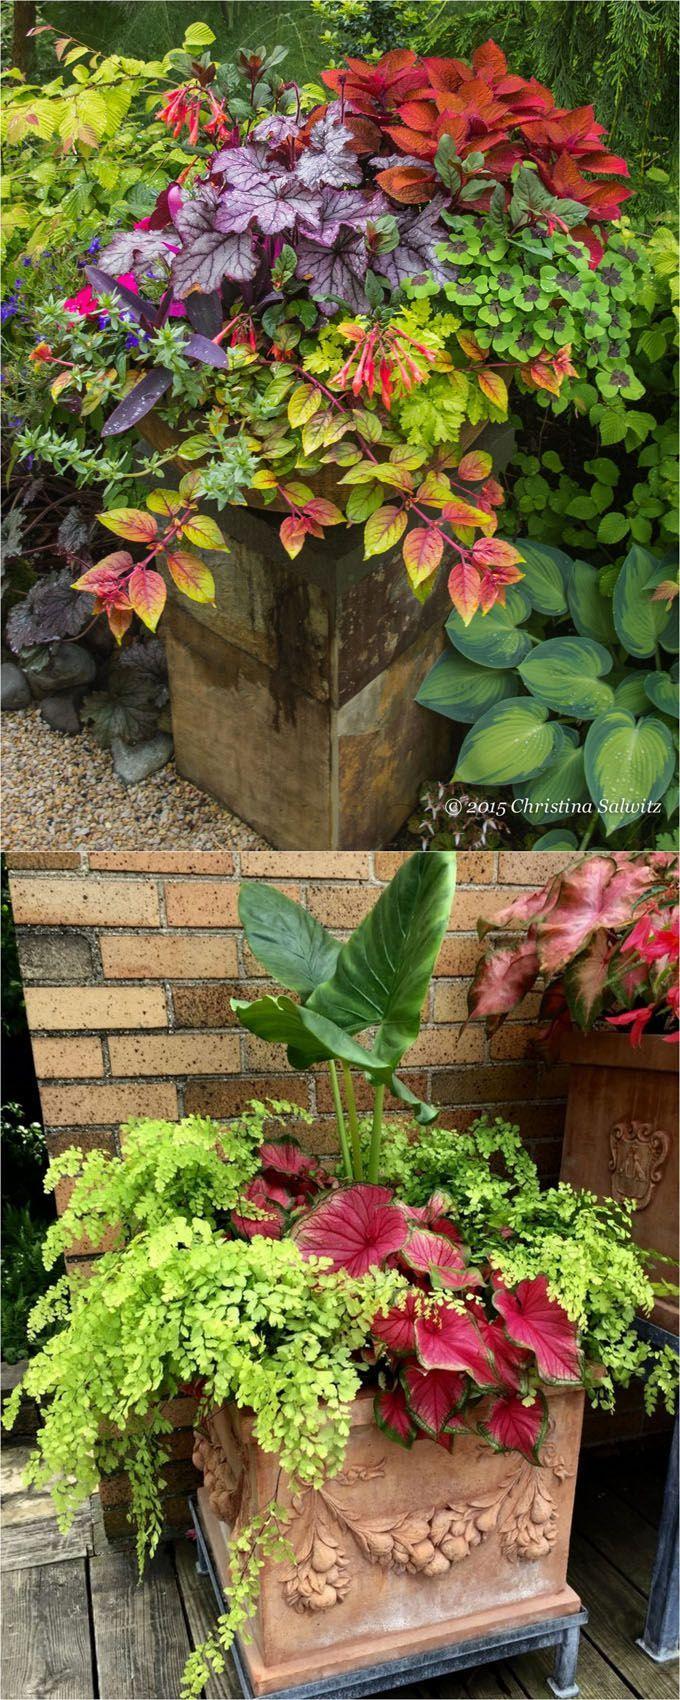 7739 best my garden, my heaven images on Pinterest | Backyard ideas ...